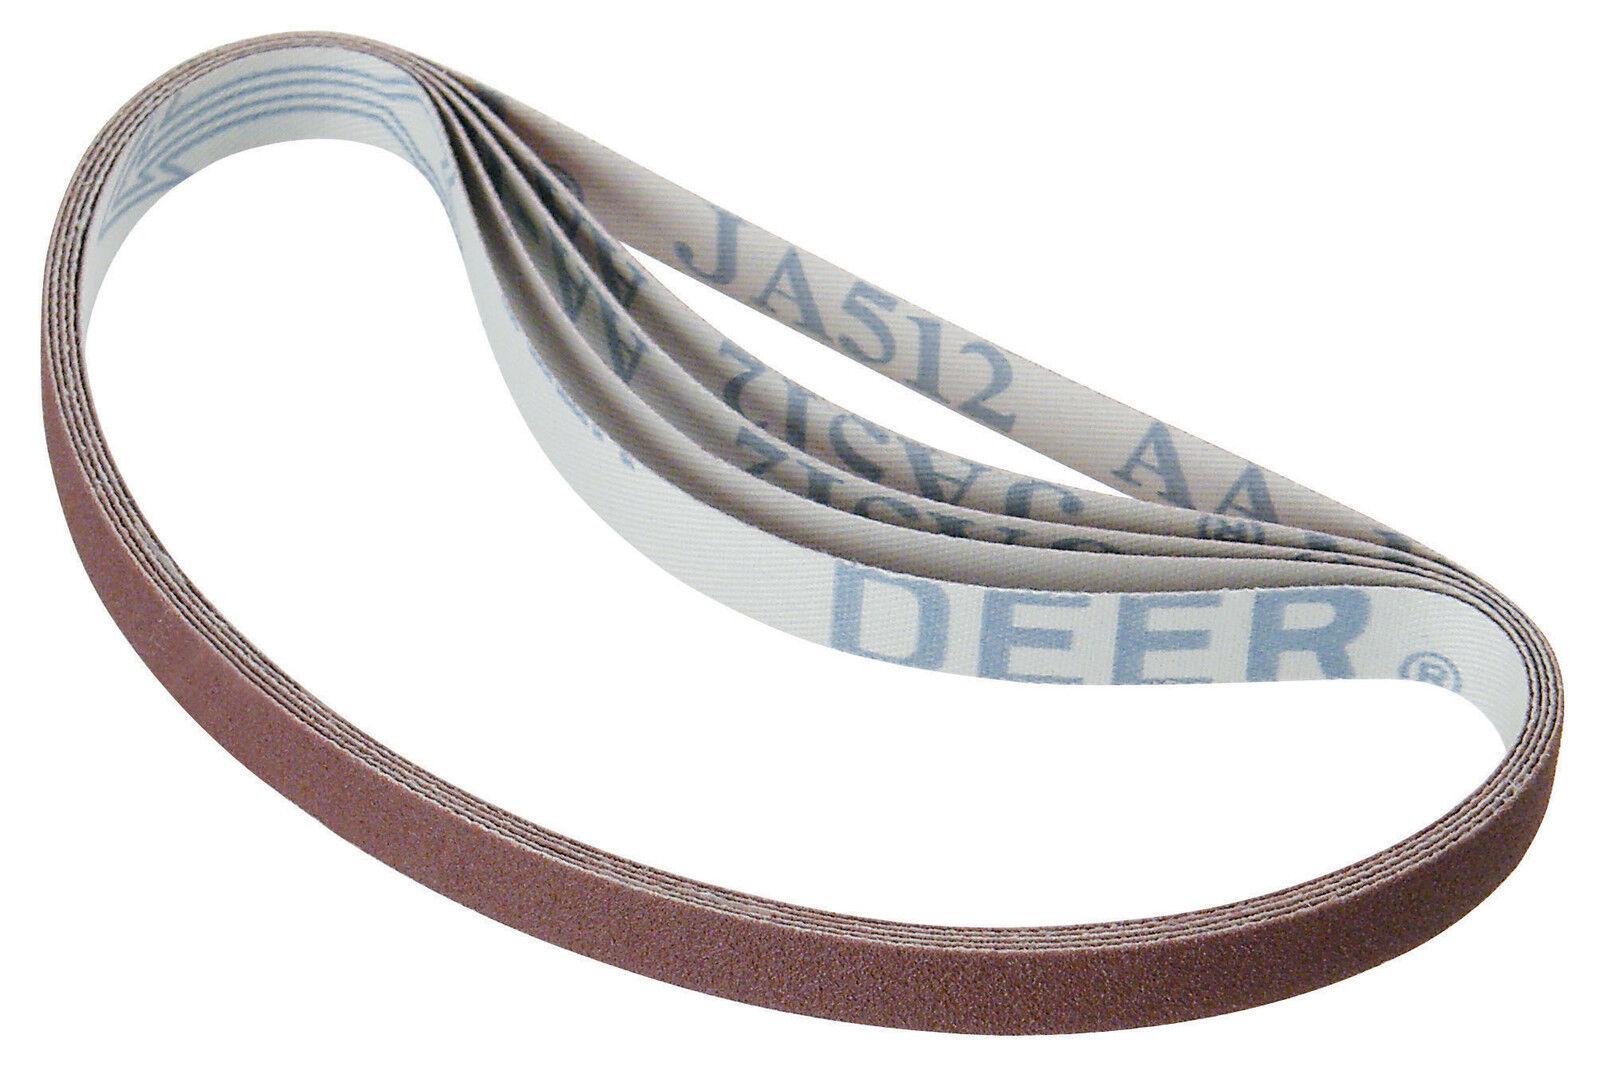 Holmenkol Replacement Sanding Belts for Smart Edger Fine